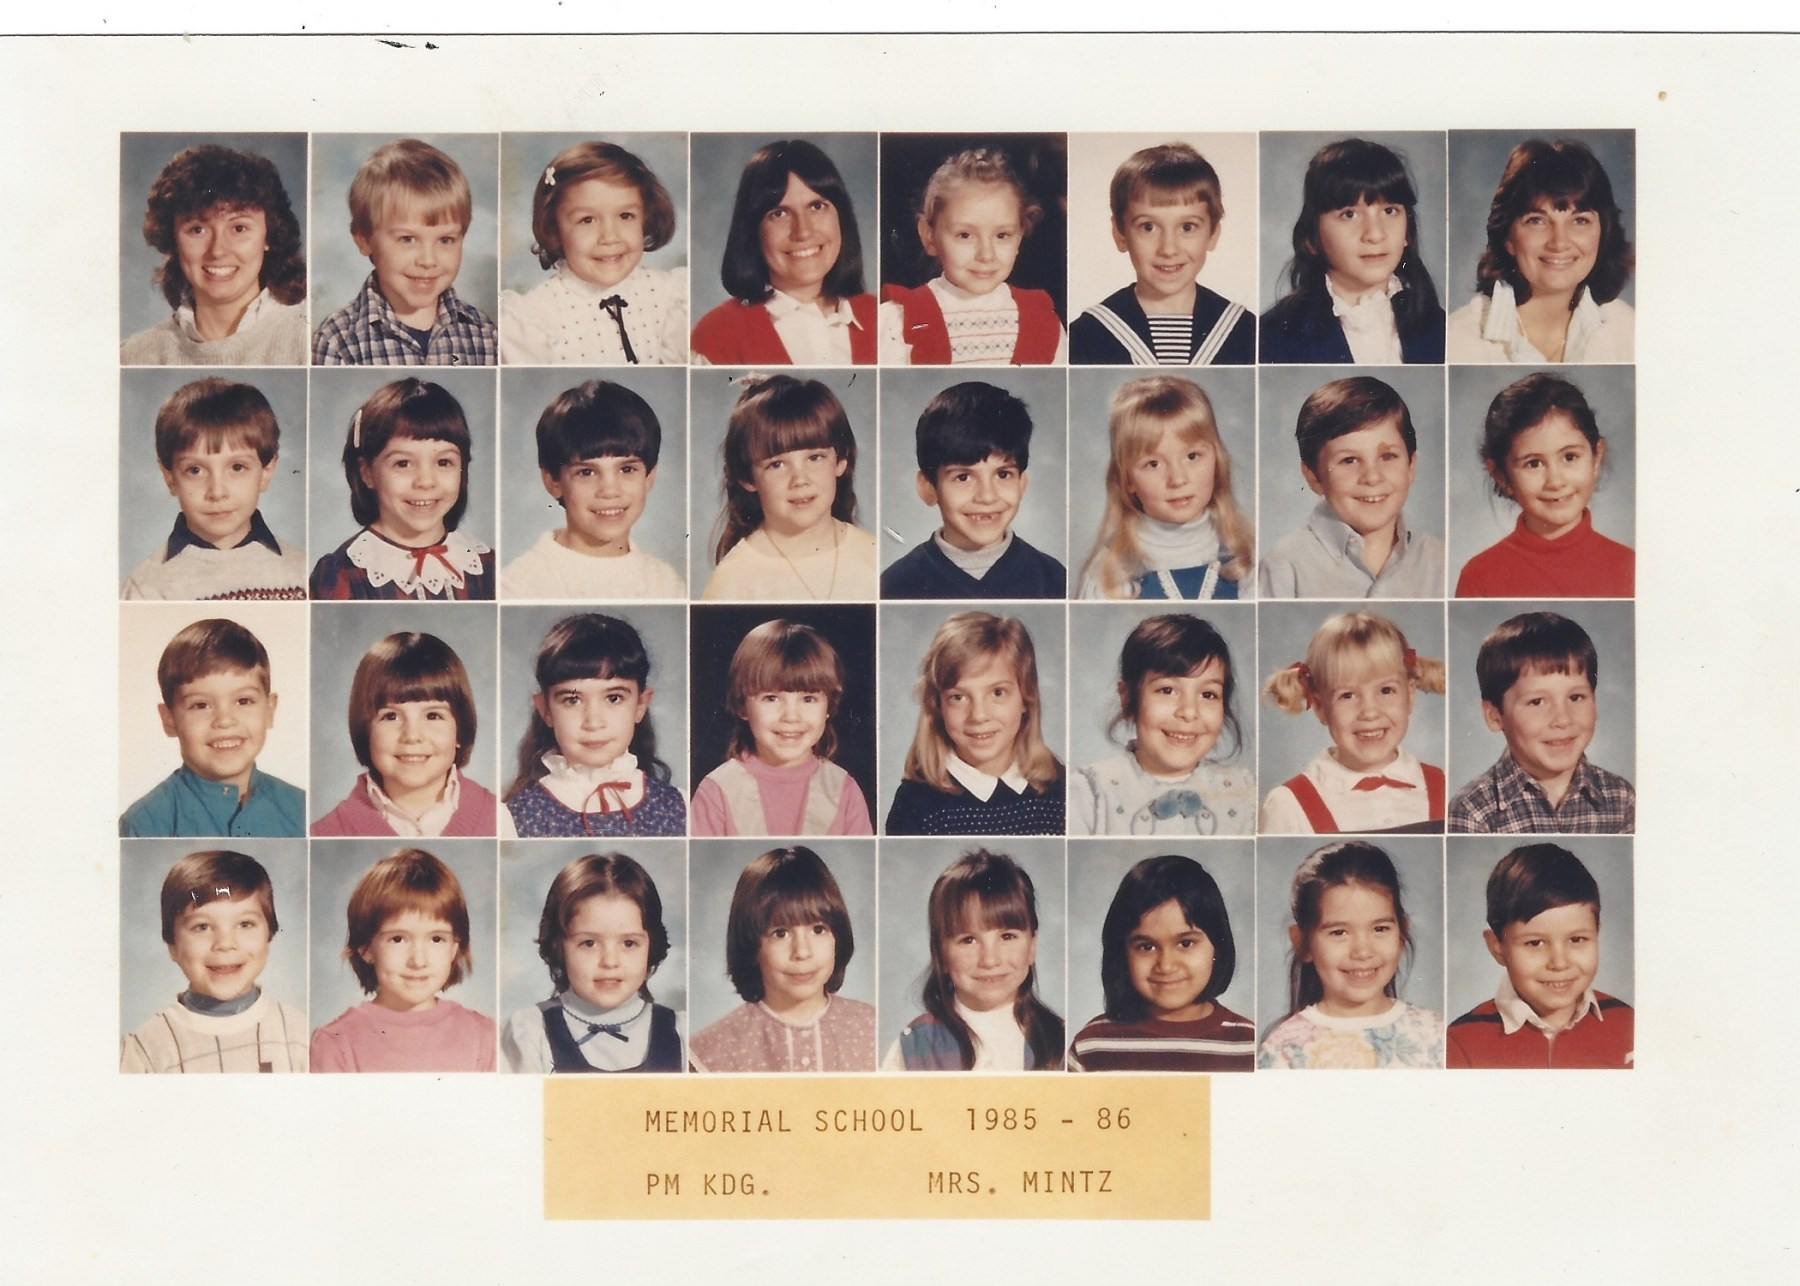 Mrs. Mintz Memorial School 1985, Burlington MA